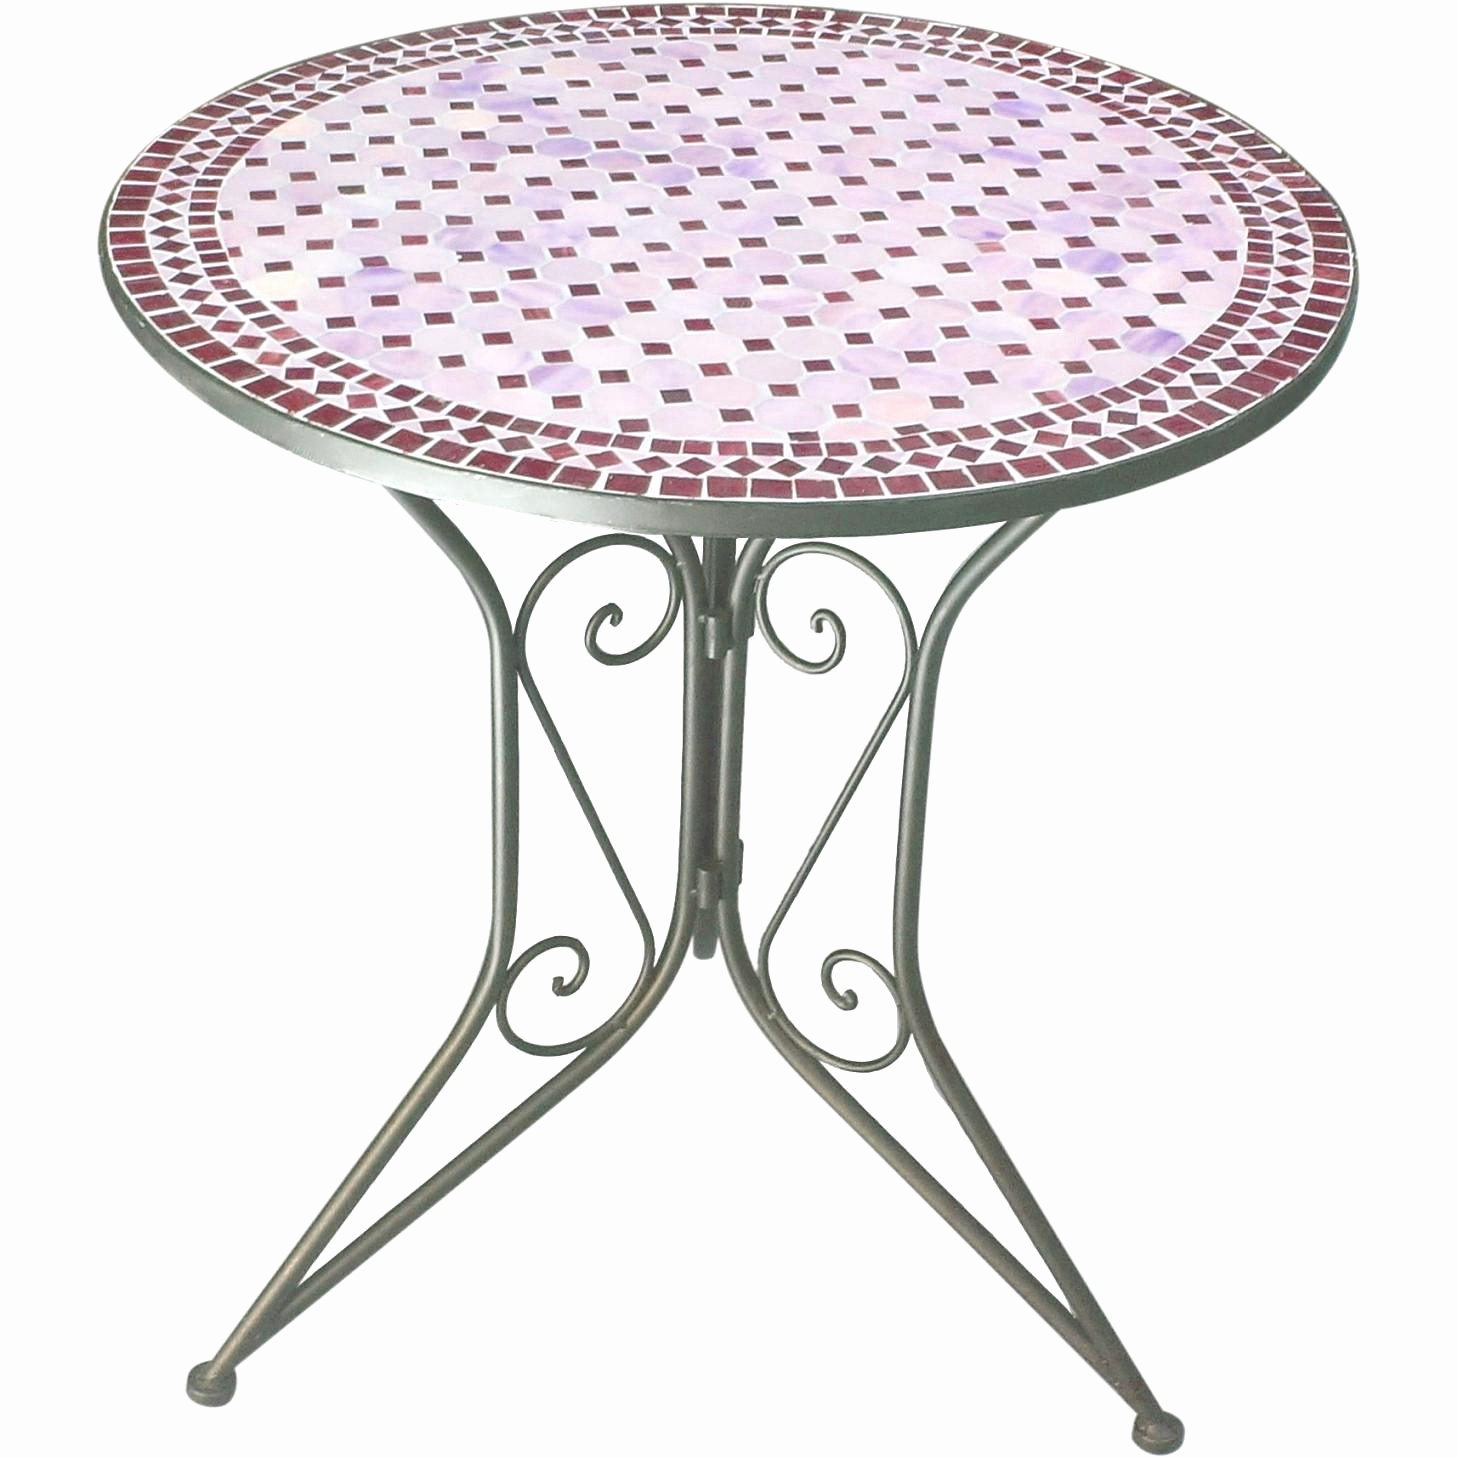 salon de jardin en metal beau 72 table ronde salon de jardin of salon de jardin en metal